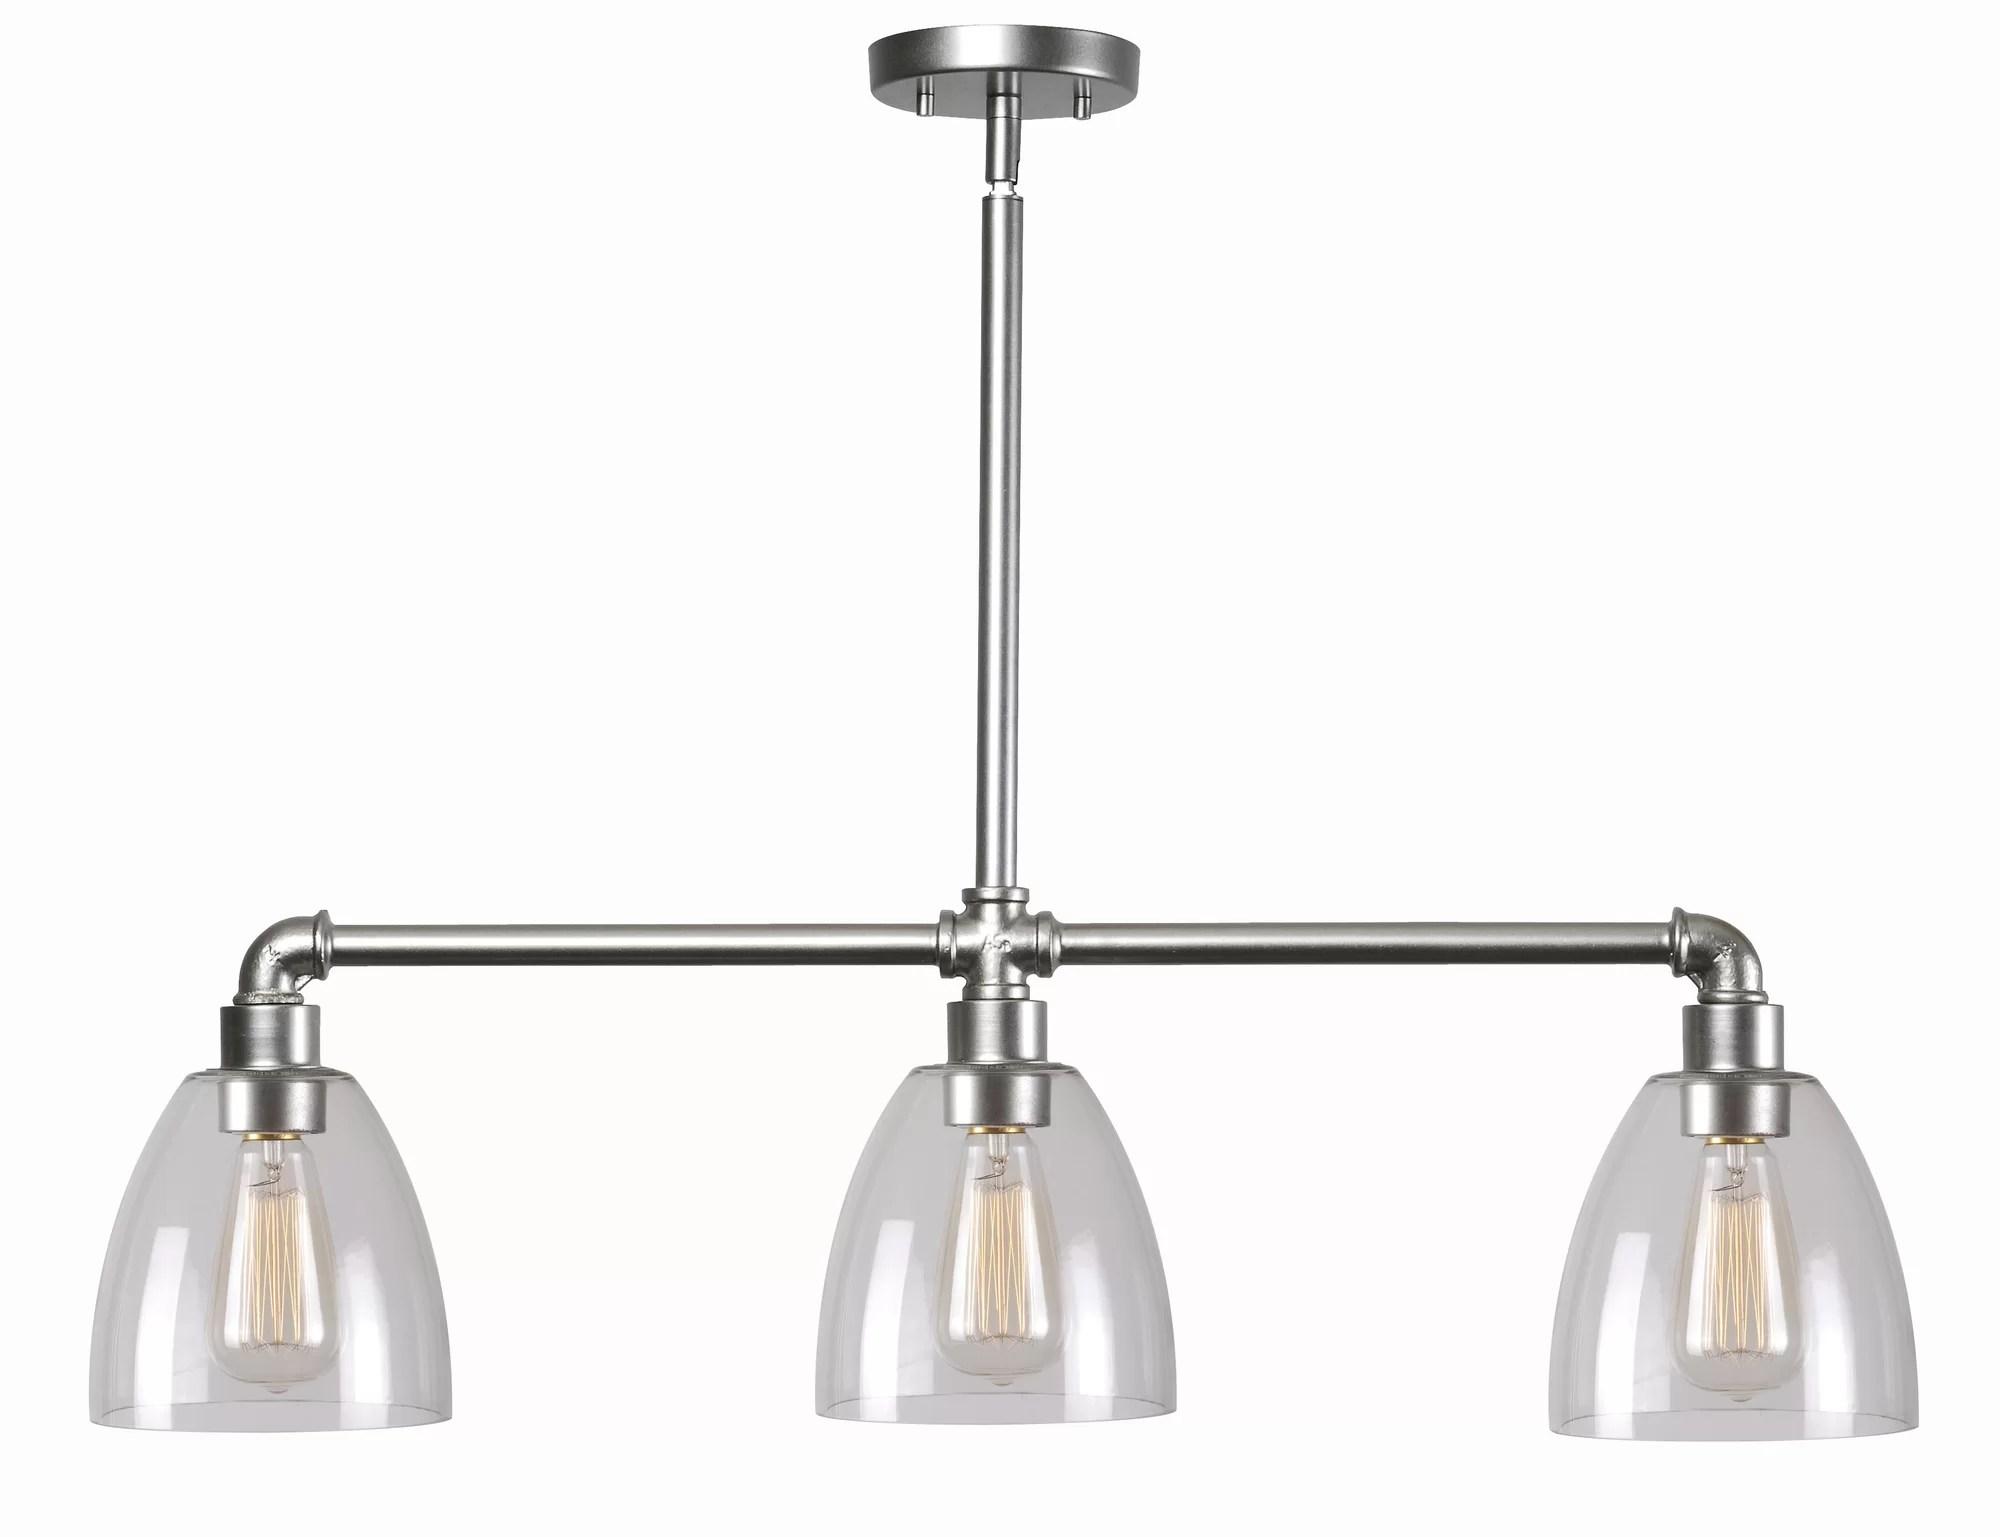 3 light kitchen island pendant items list wildon home  industrial fitter